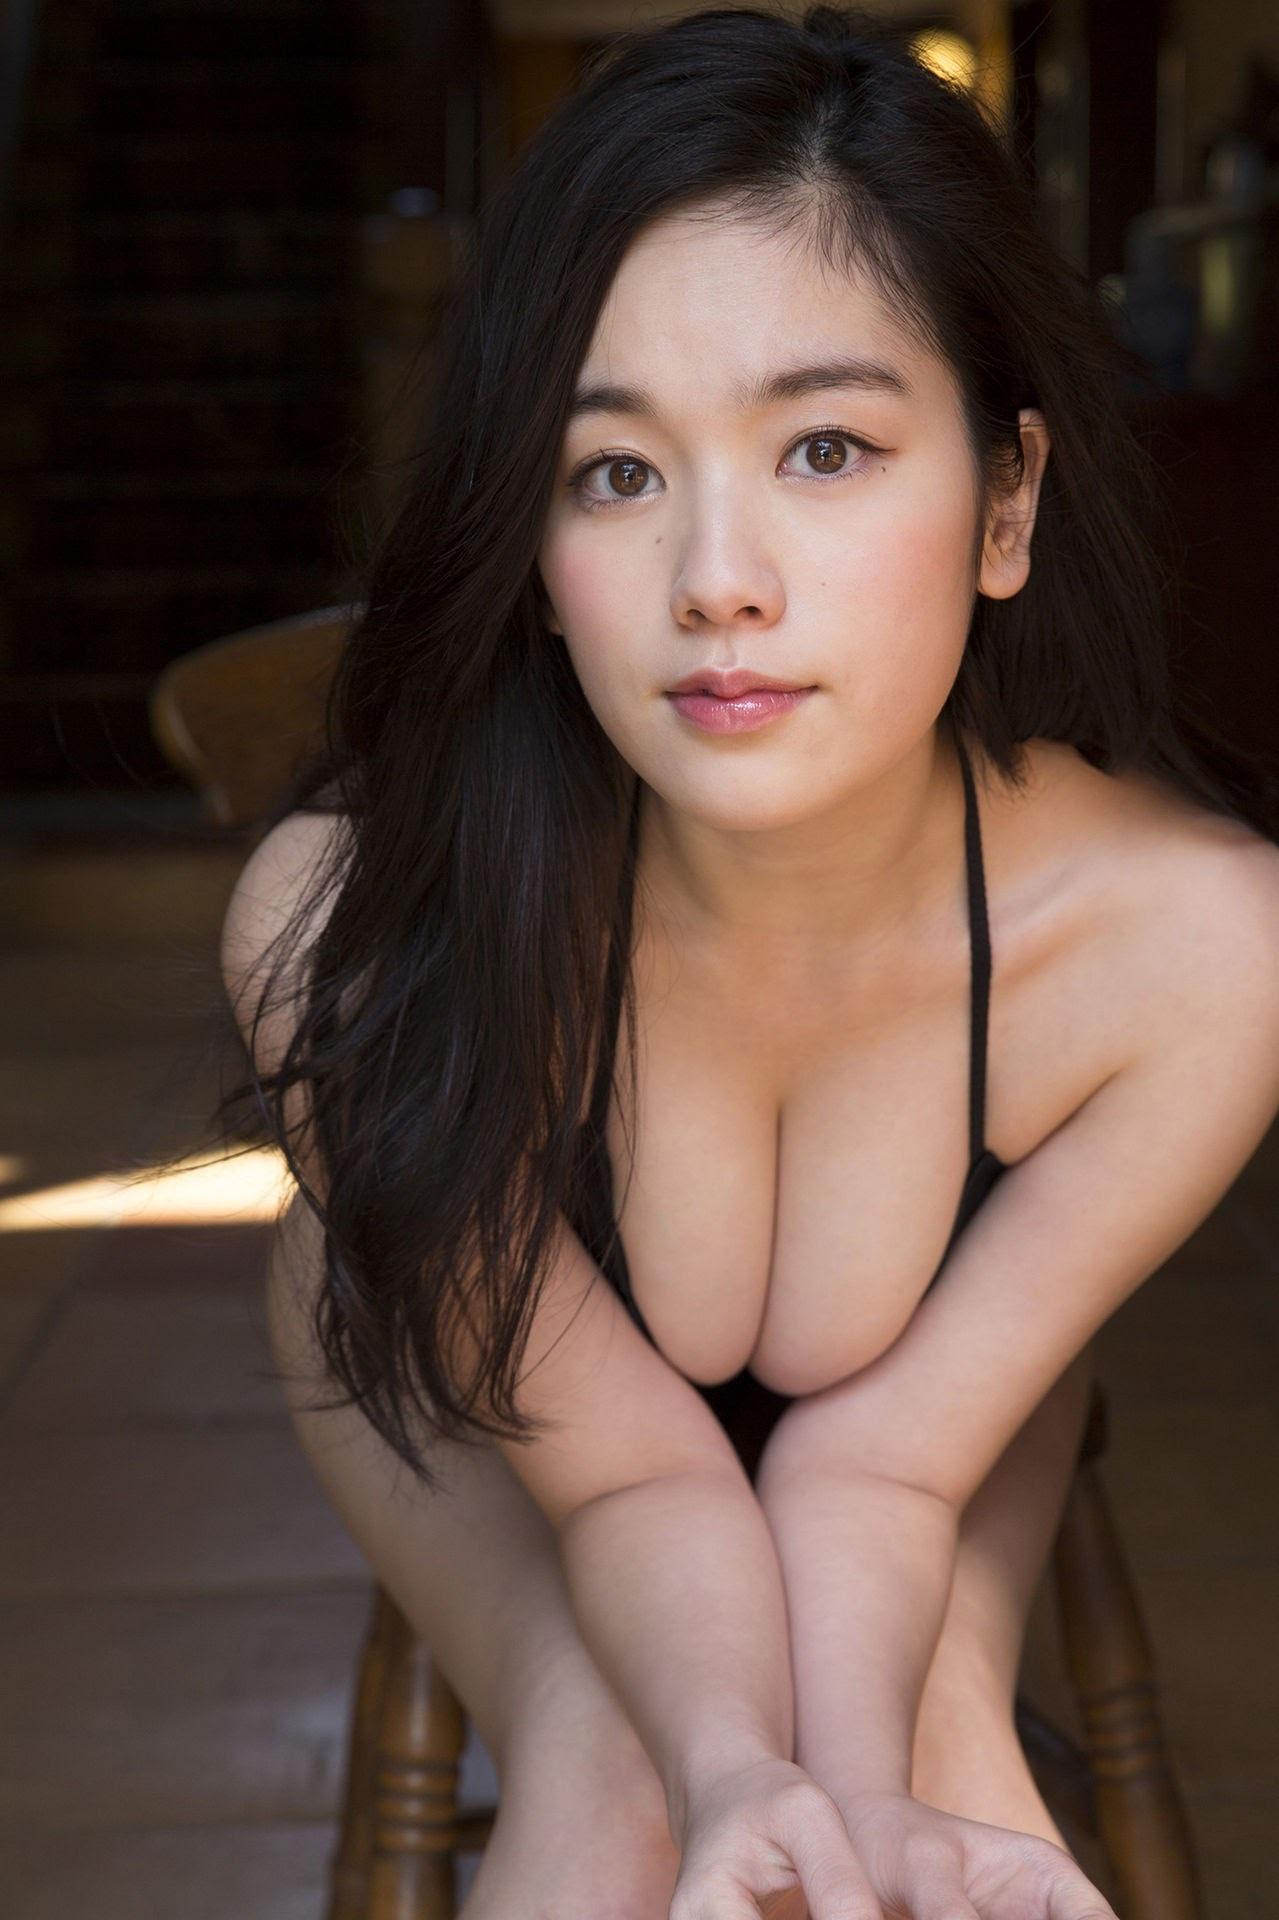 Goddess of Temptation Miwako Kakehi 039